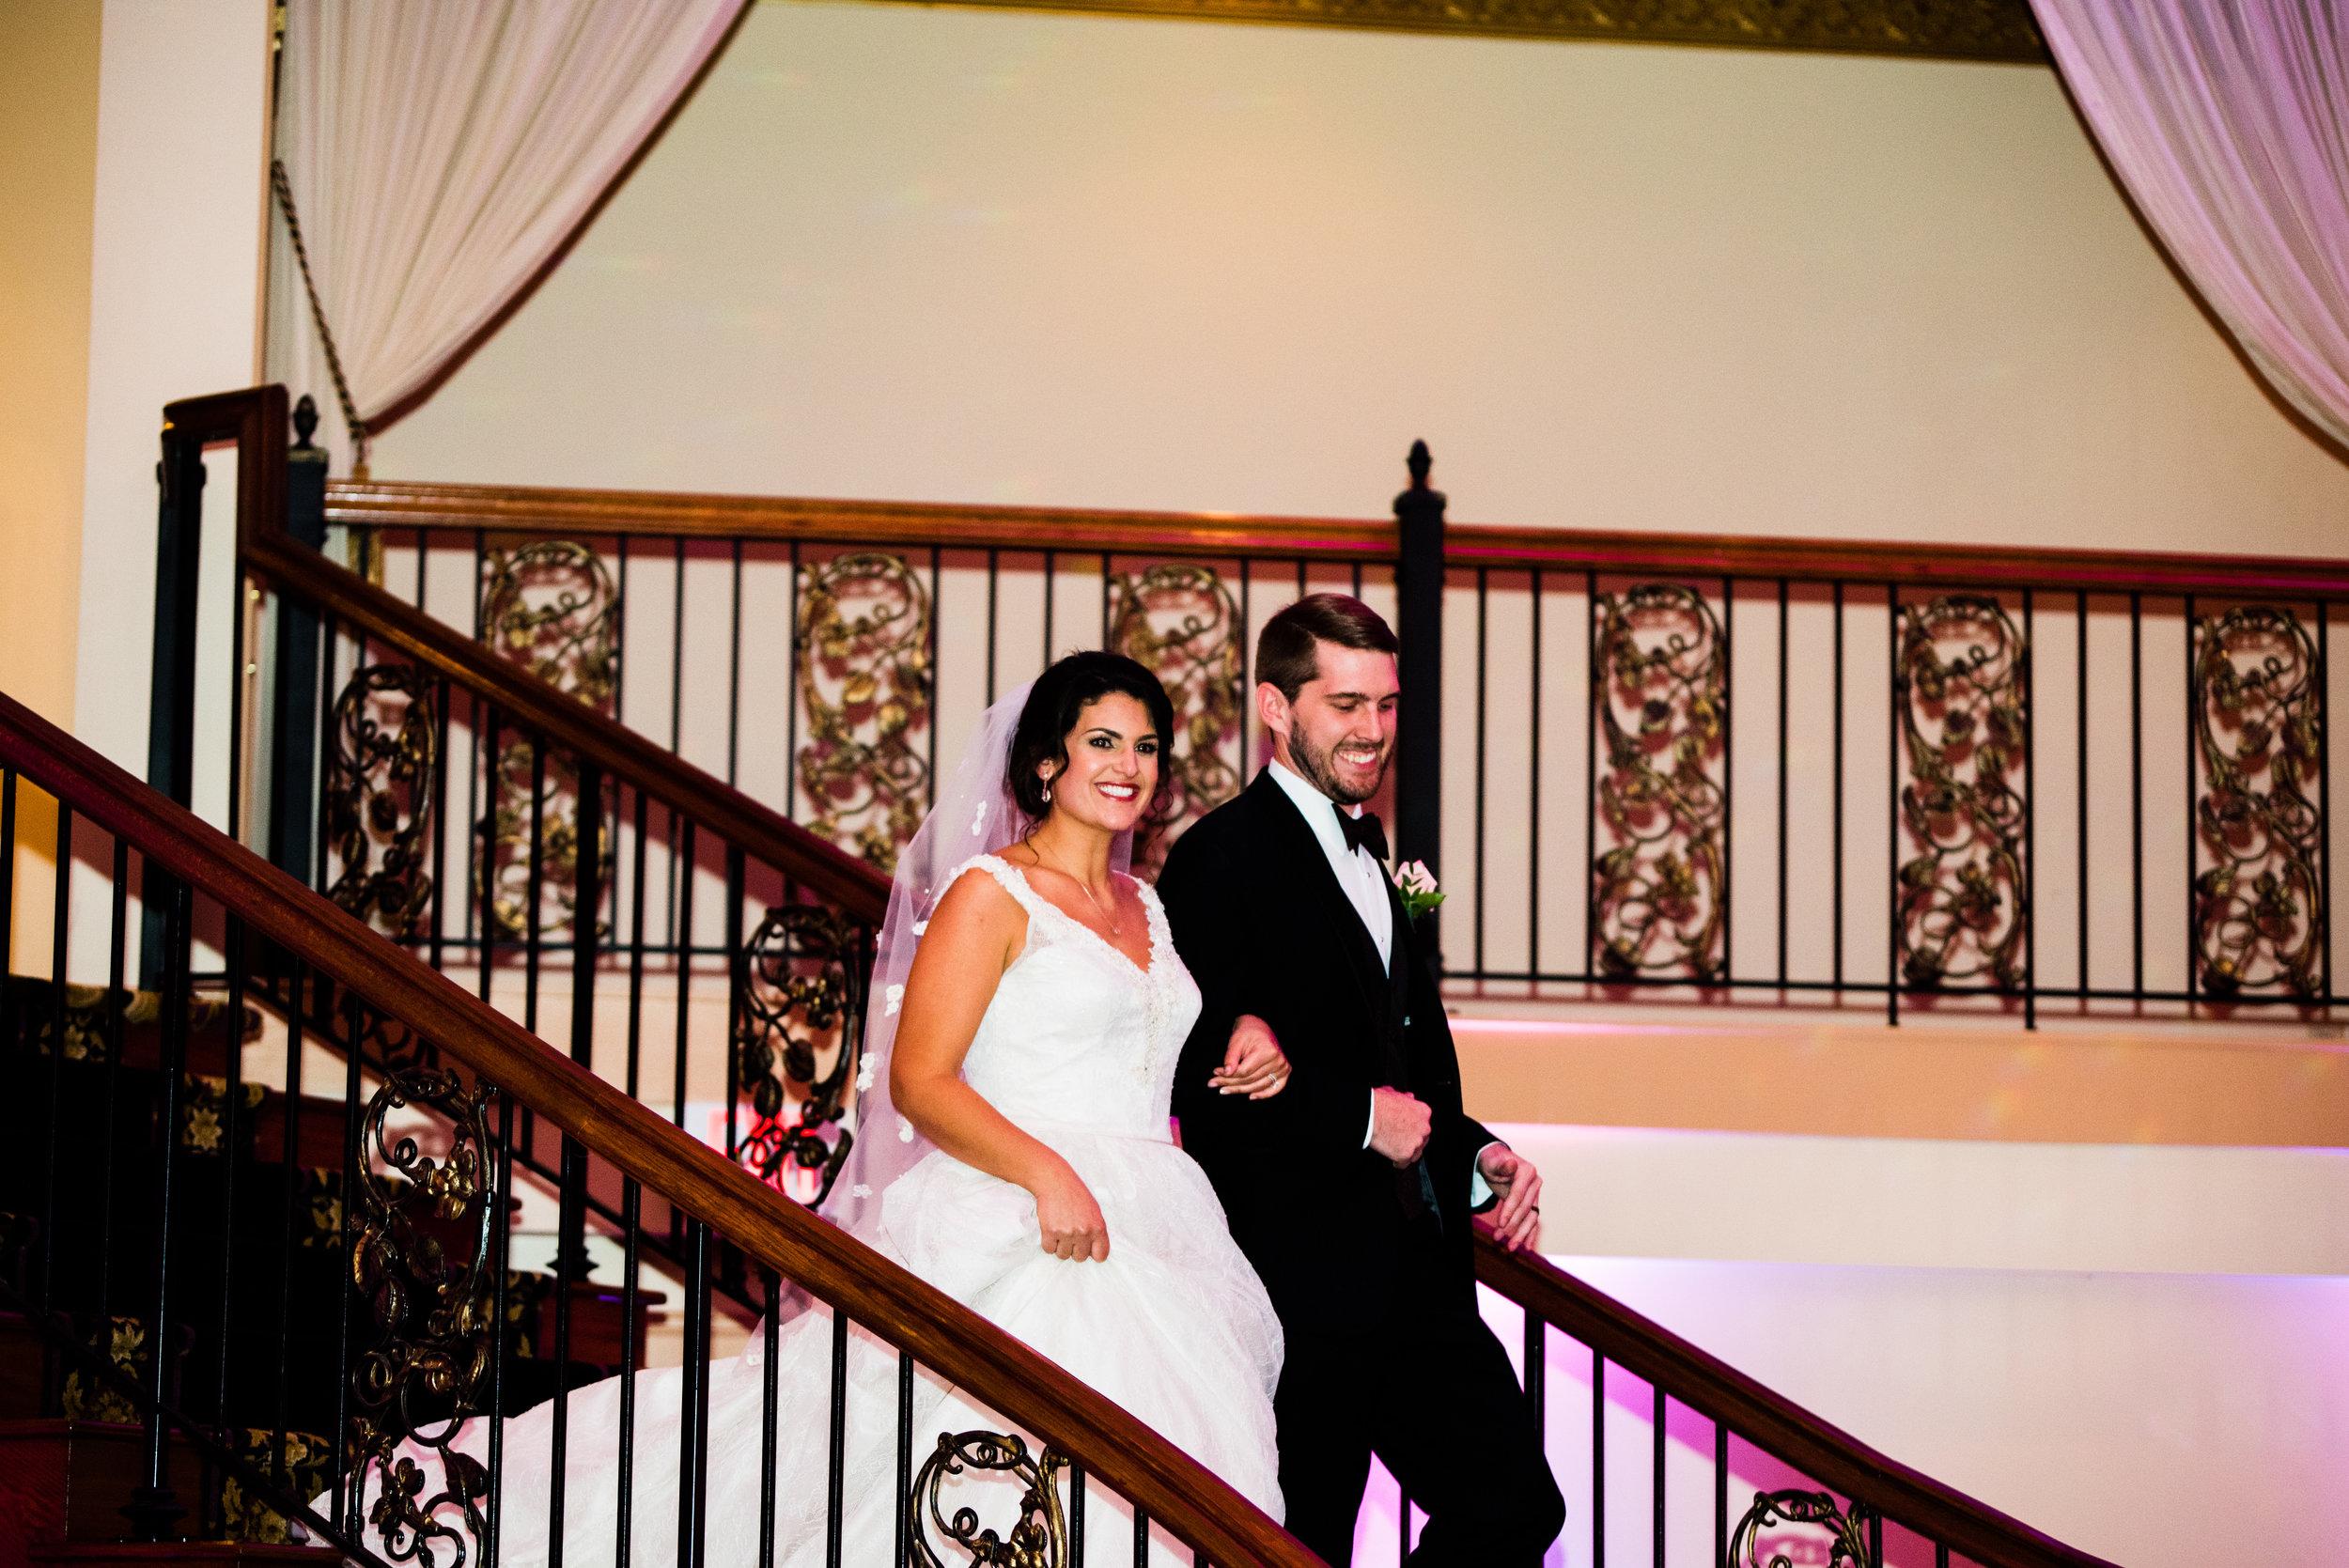 Luciens Manor Wedding Photos - 087.jpg